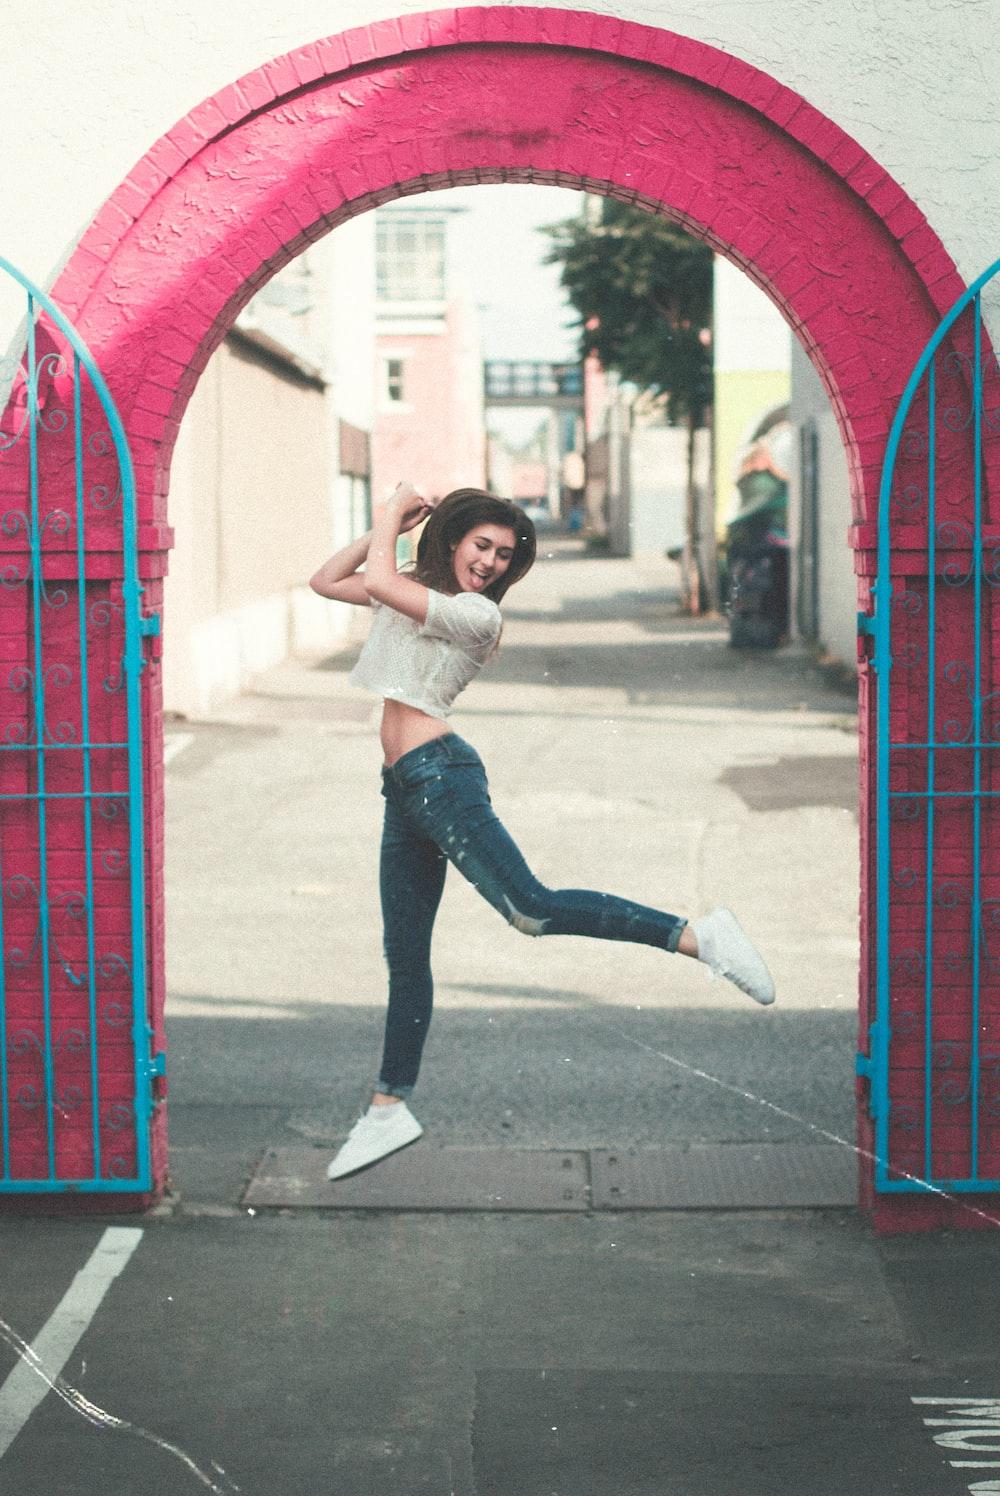 woman jumping near gate